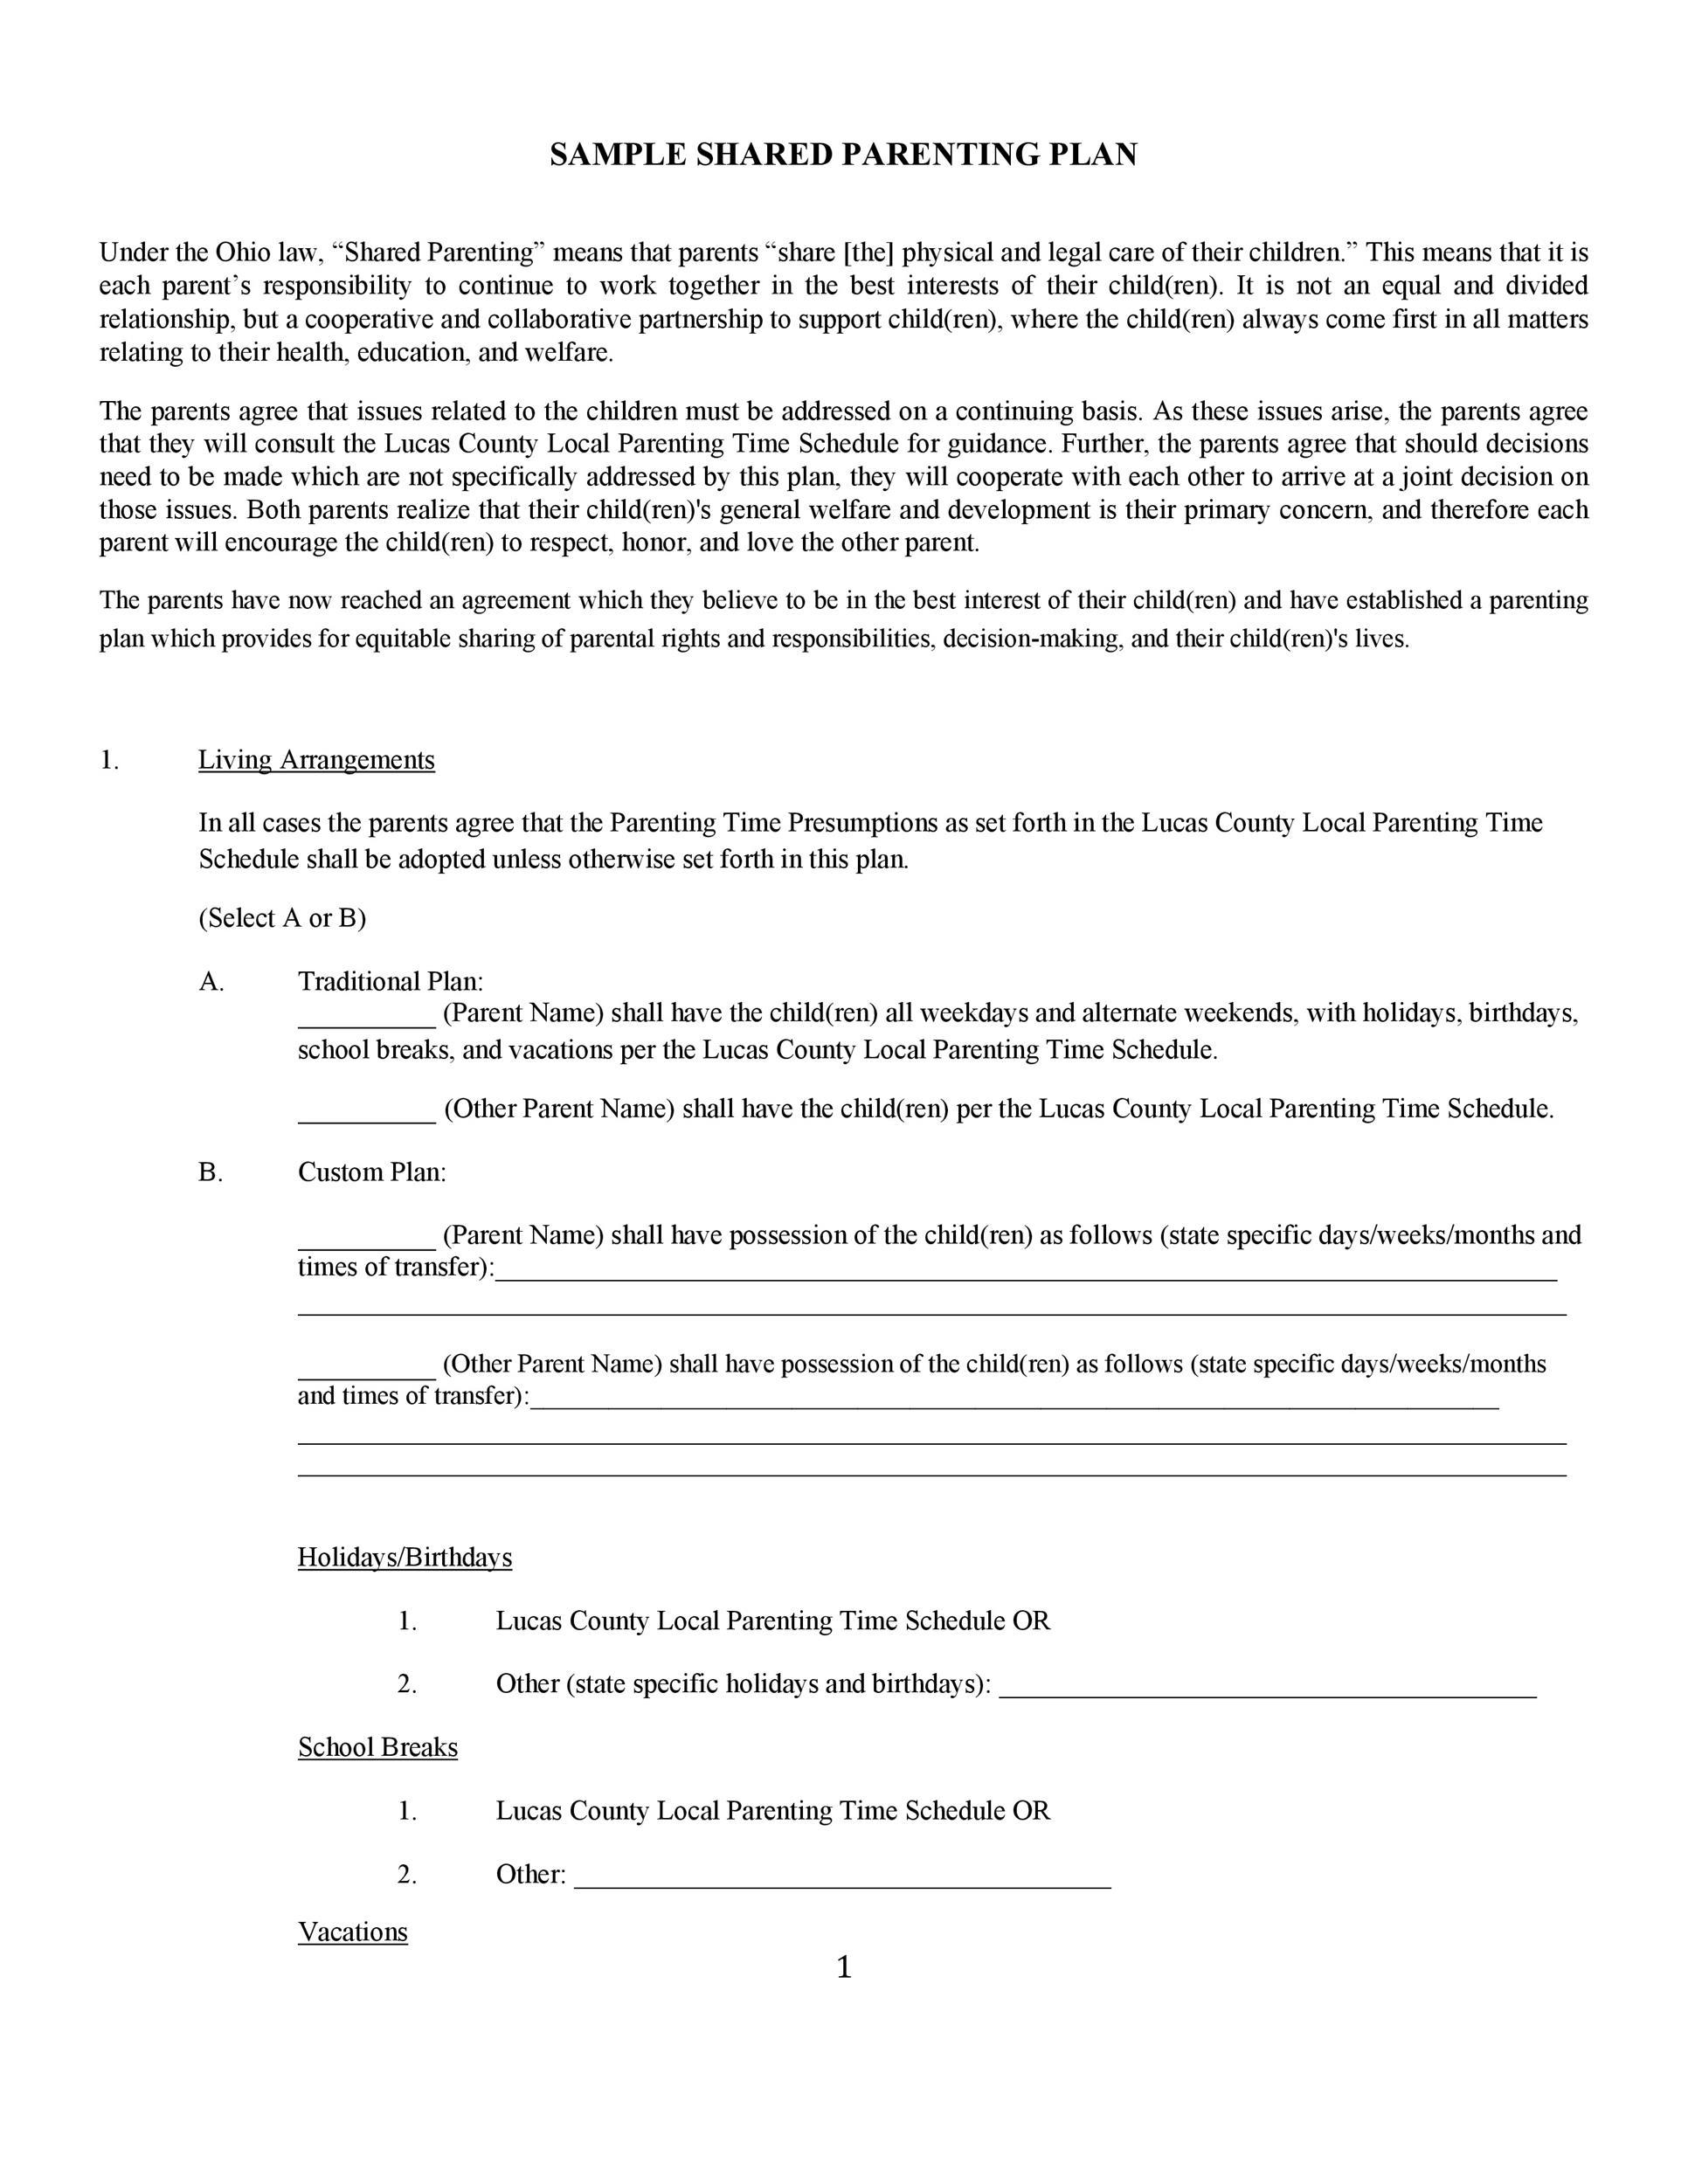 Free parenting plan template 14